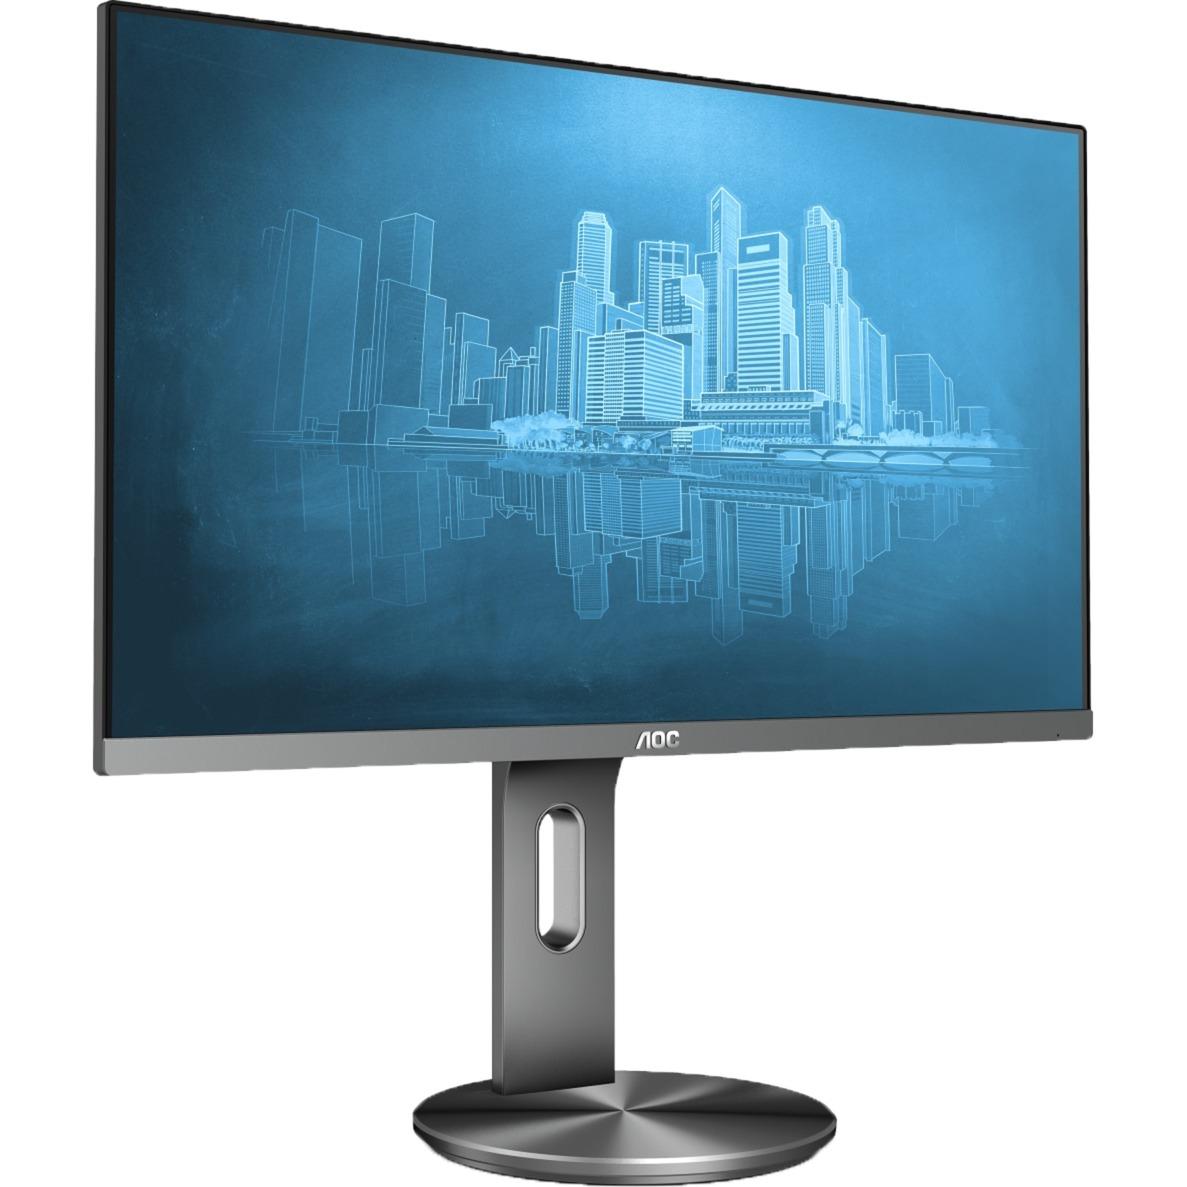 "Pro-line I2790PQU/BT pantalla para PC 68,6 cm (27"") Full HD LED Plana Gris, Monitor LED"